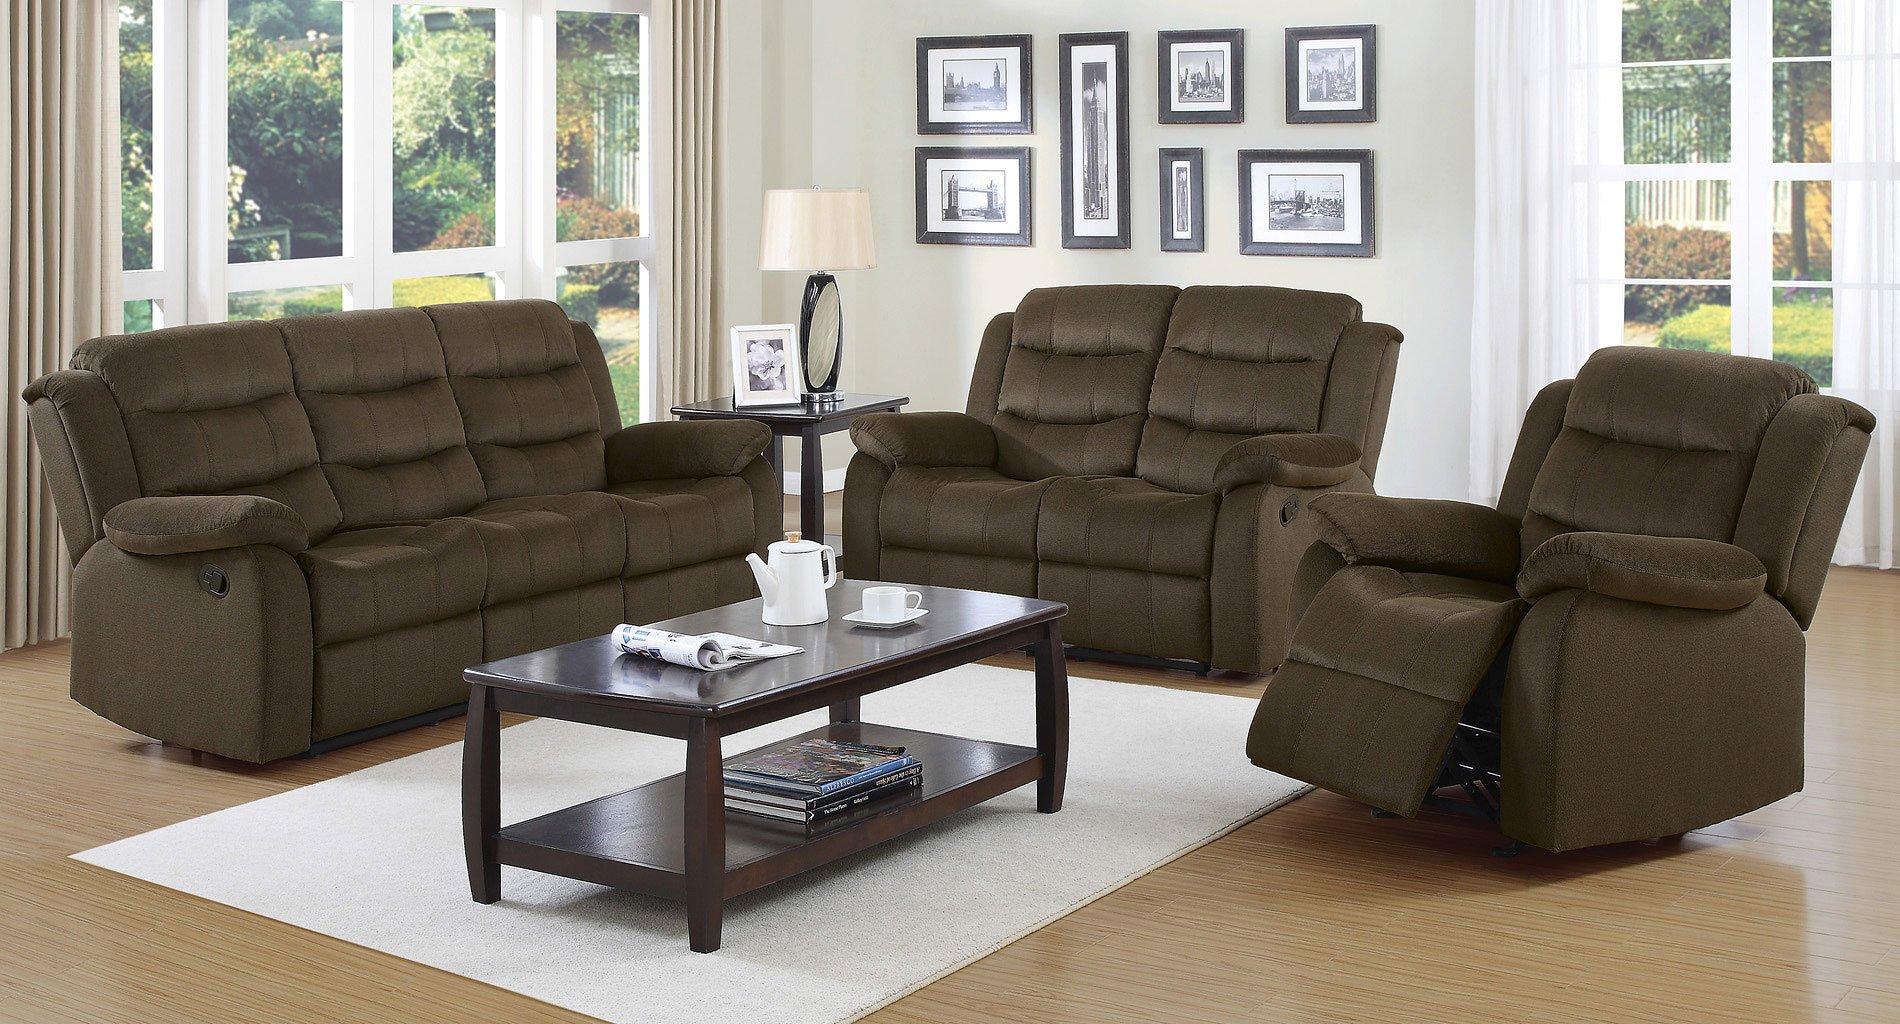 Rodman Reclining Living Room Set Chocolate Living Room Sets Living Room Furniture Living